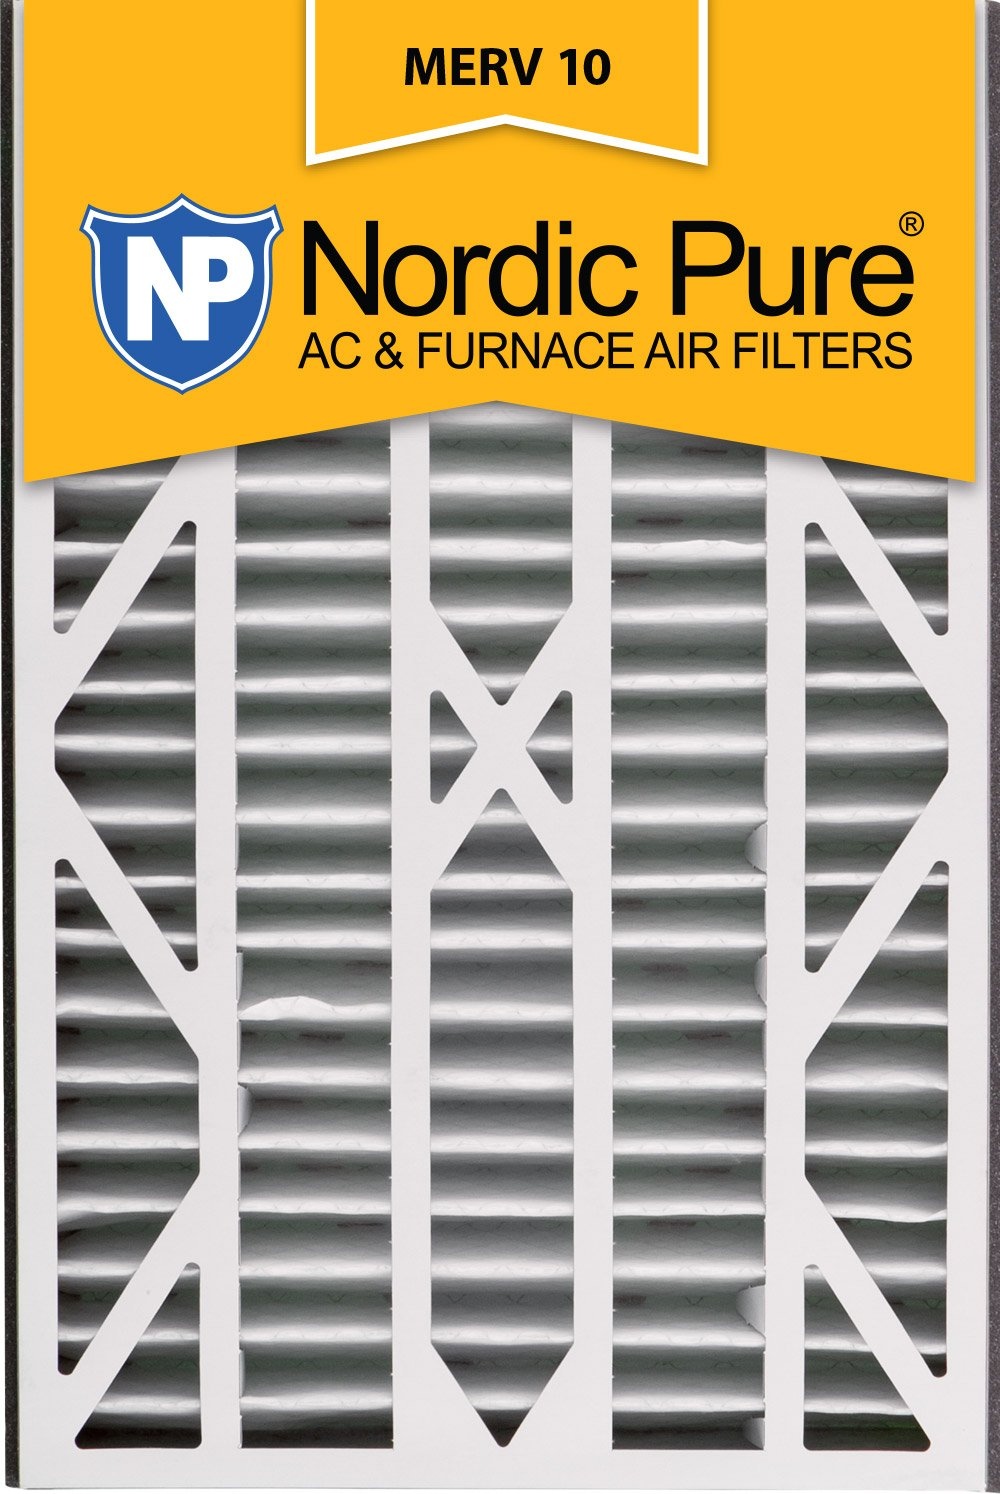 Nordic Pure 16x25x3ABM10-1 Merv 10 AC 炉灶过滤器